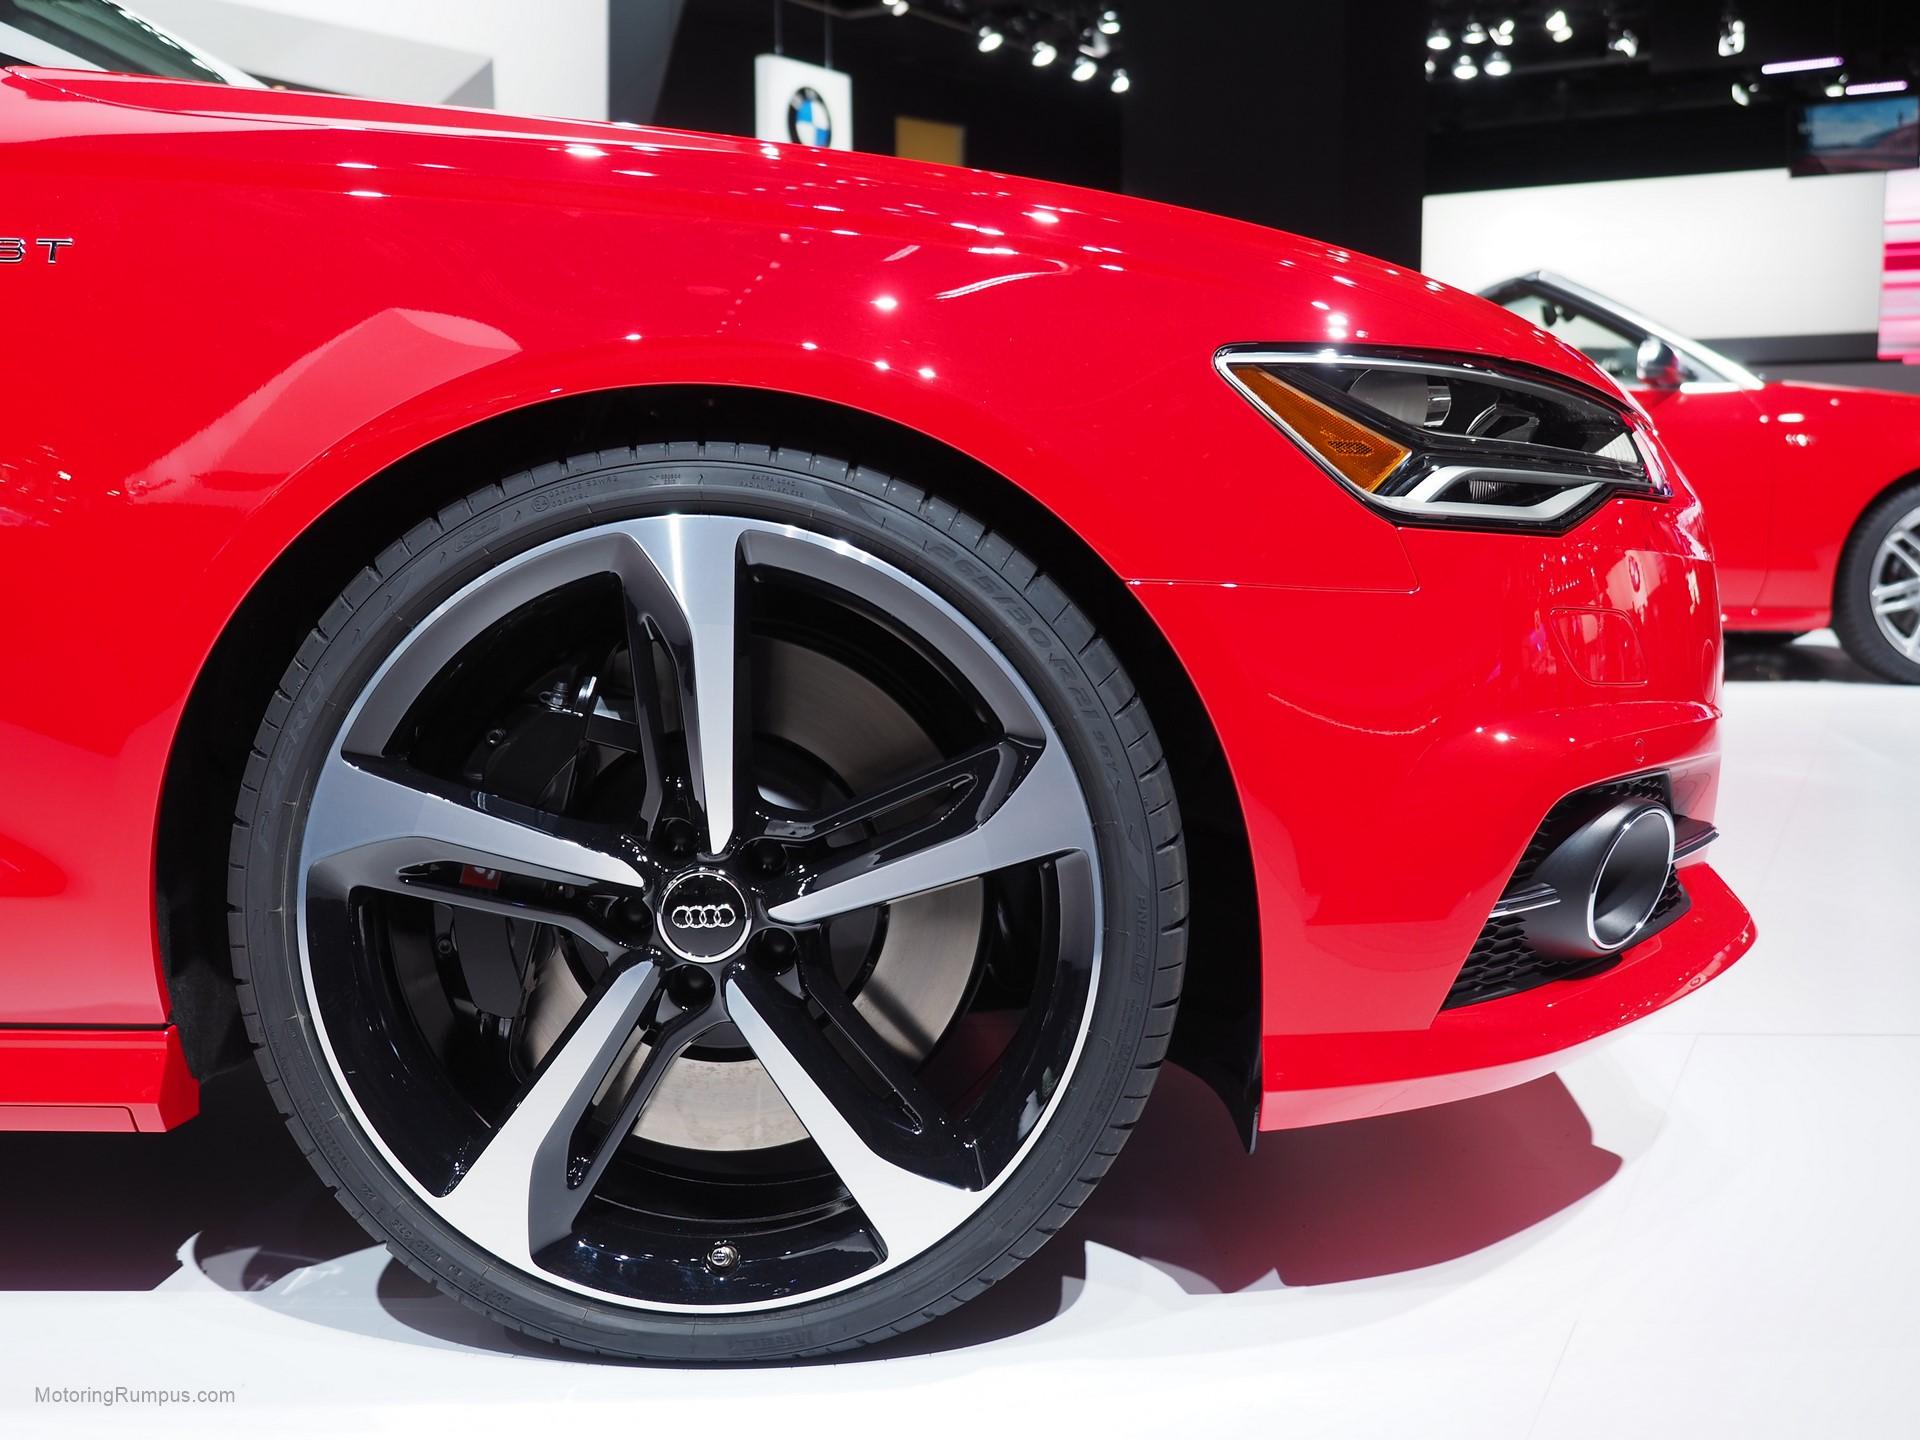 2016 NAIAS Audi S6 21-inch Wheel